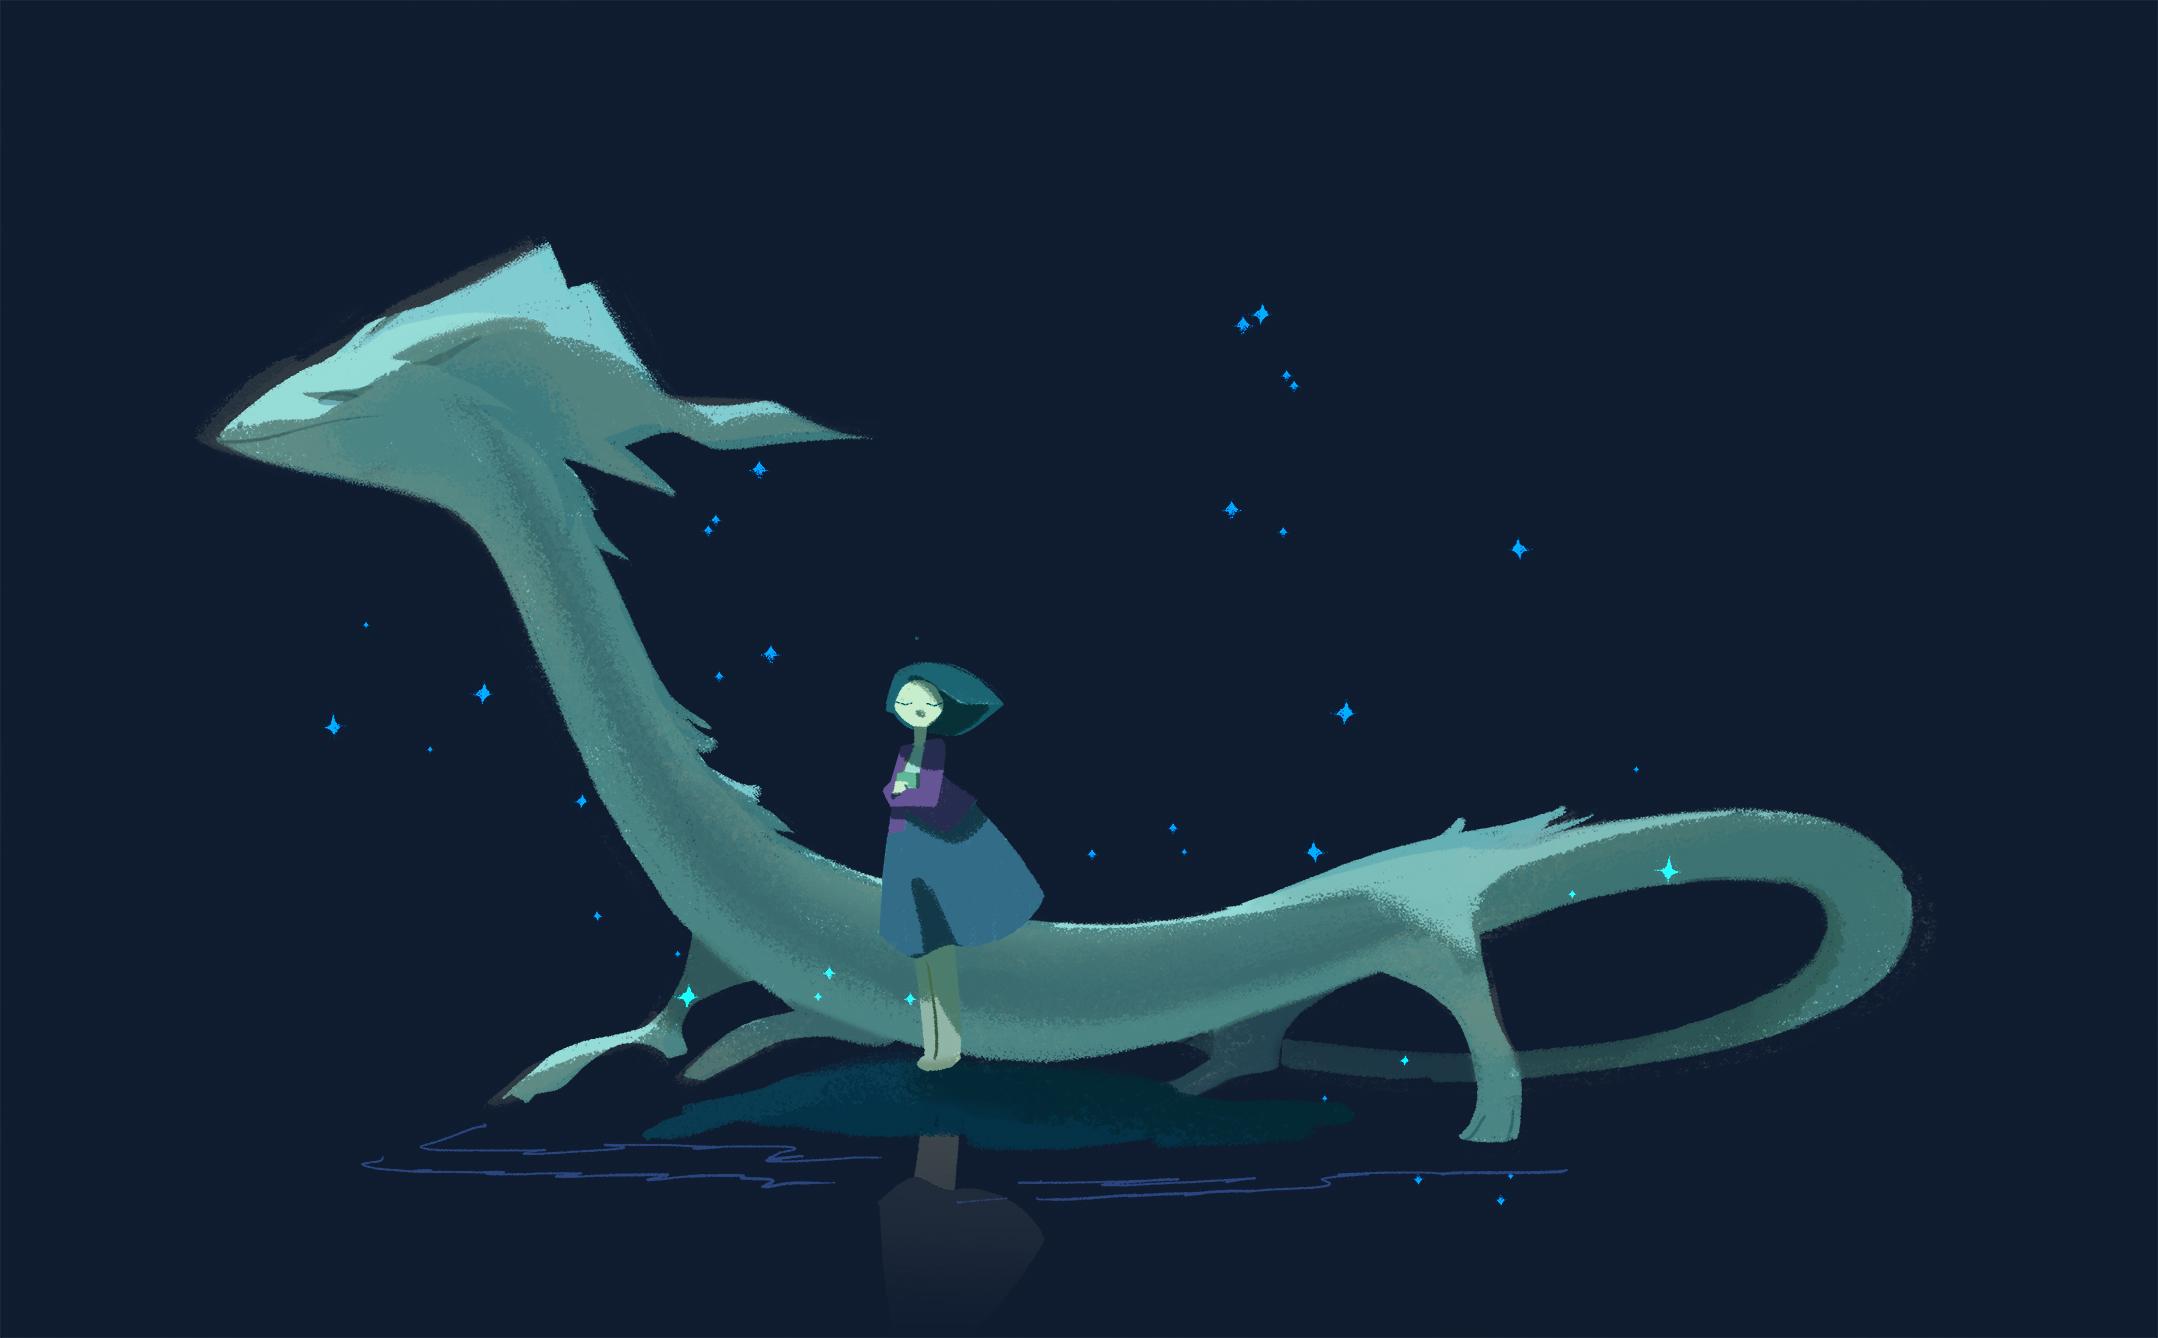 dragons4.jpg